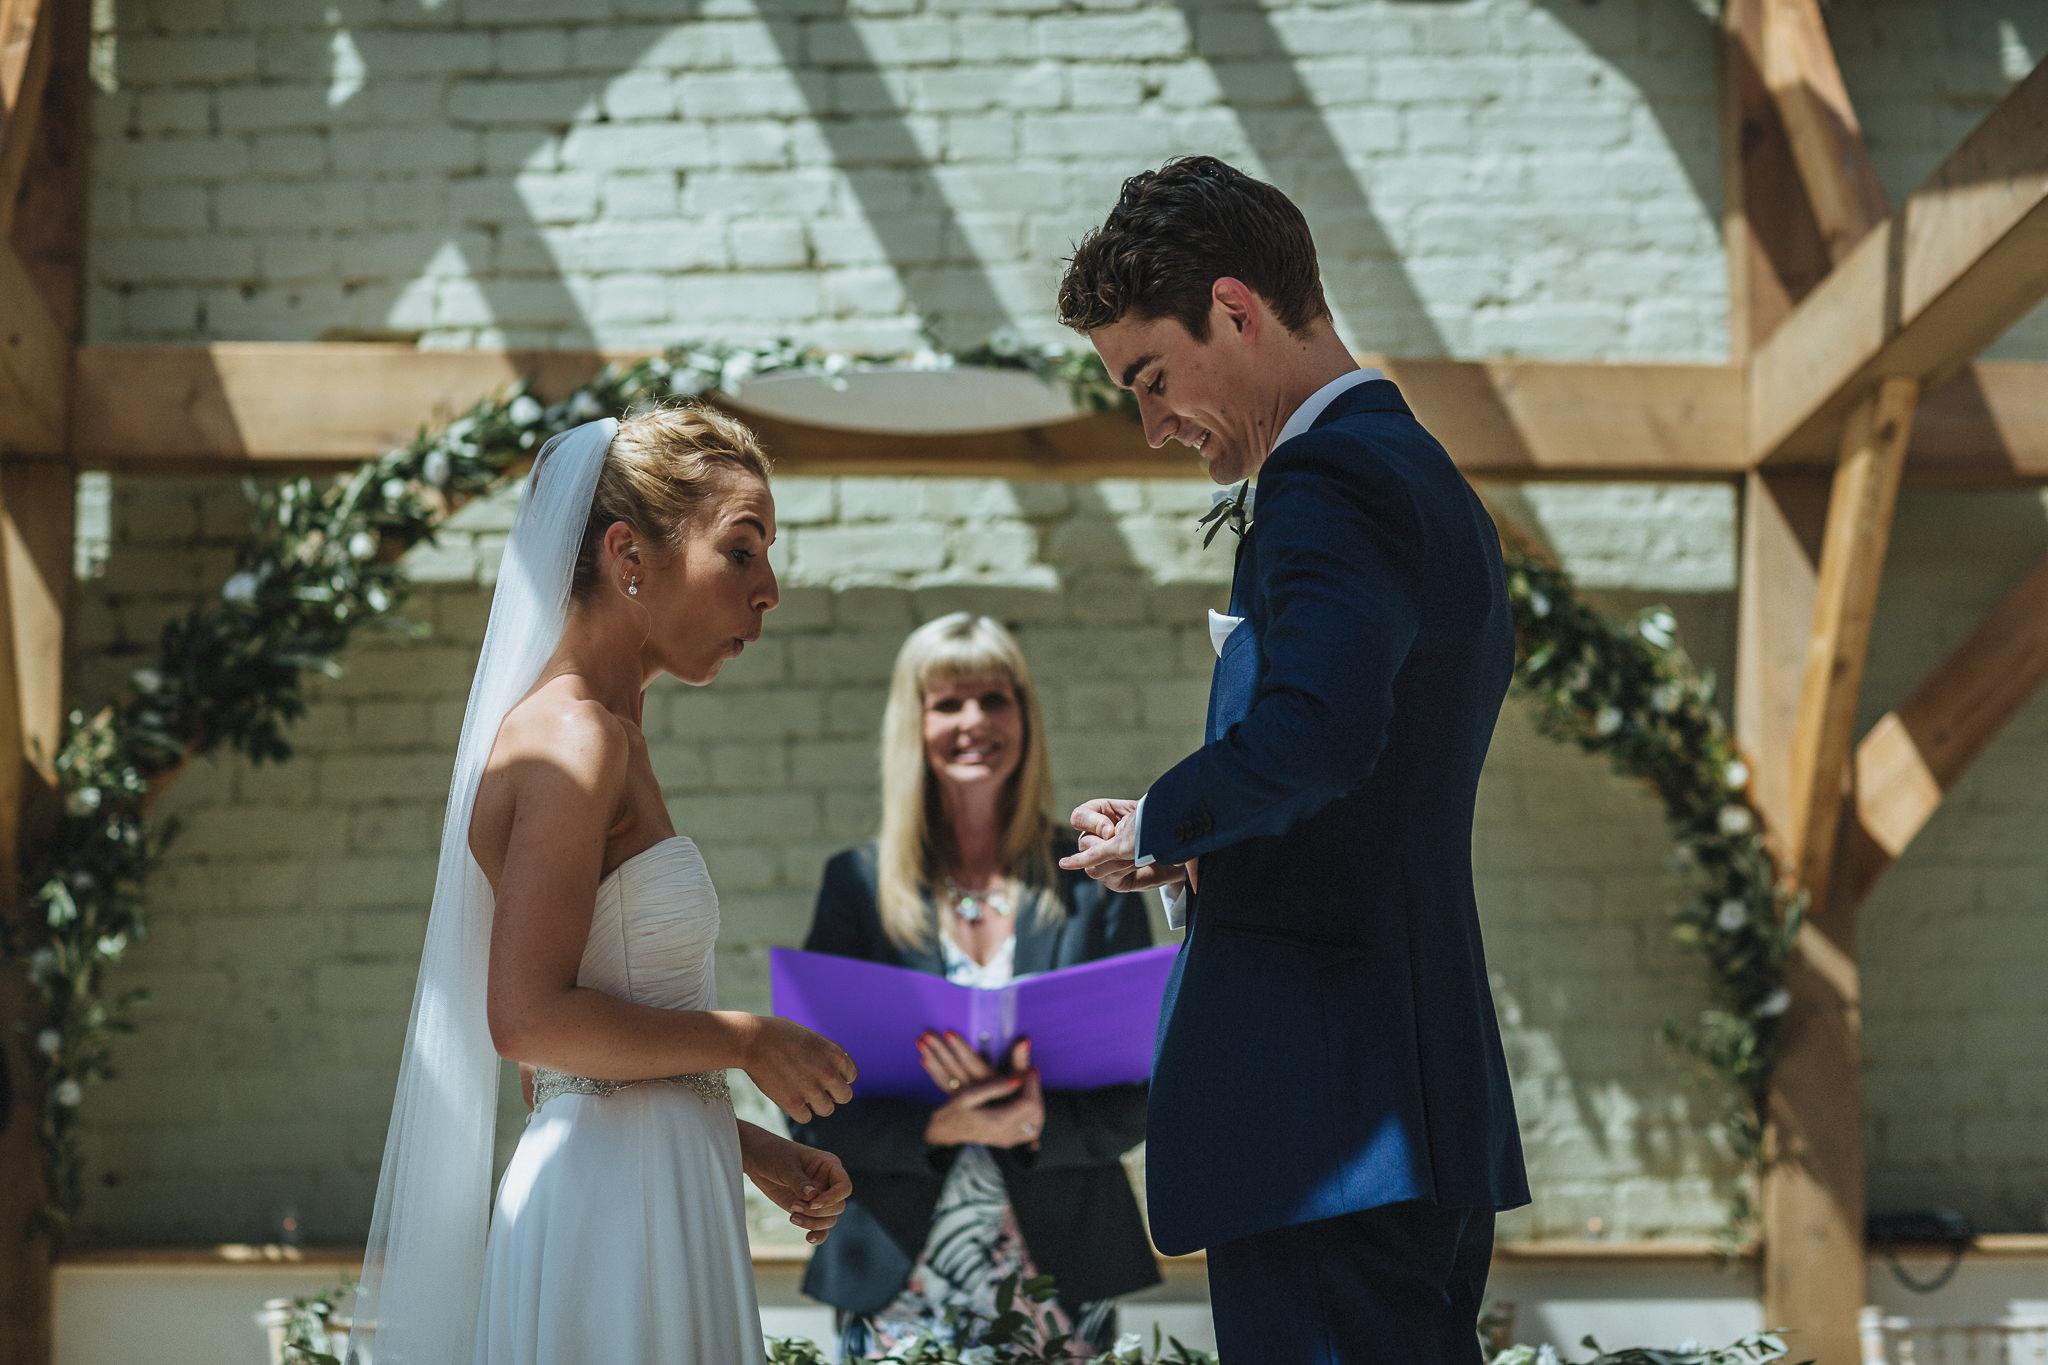 paul-marbrook-Gaynes-Park Wedding-Photographer-90051